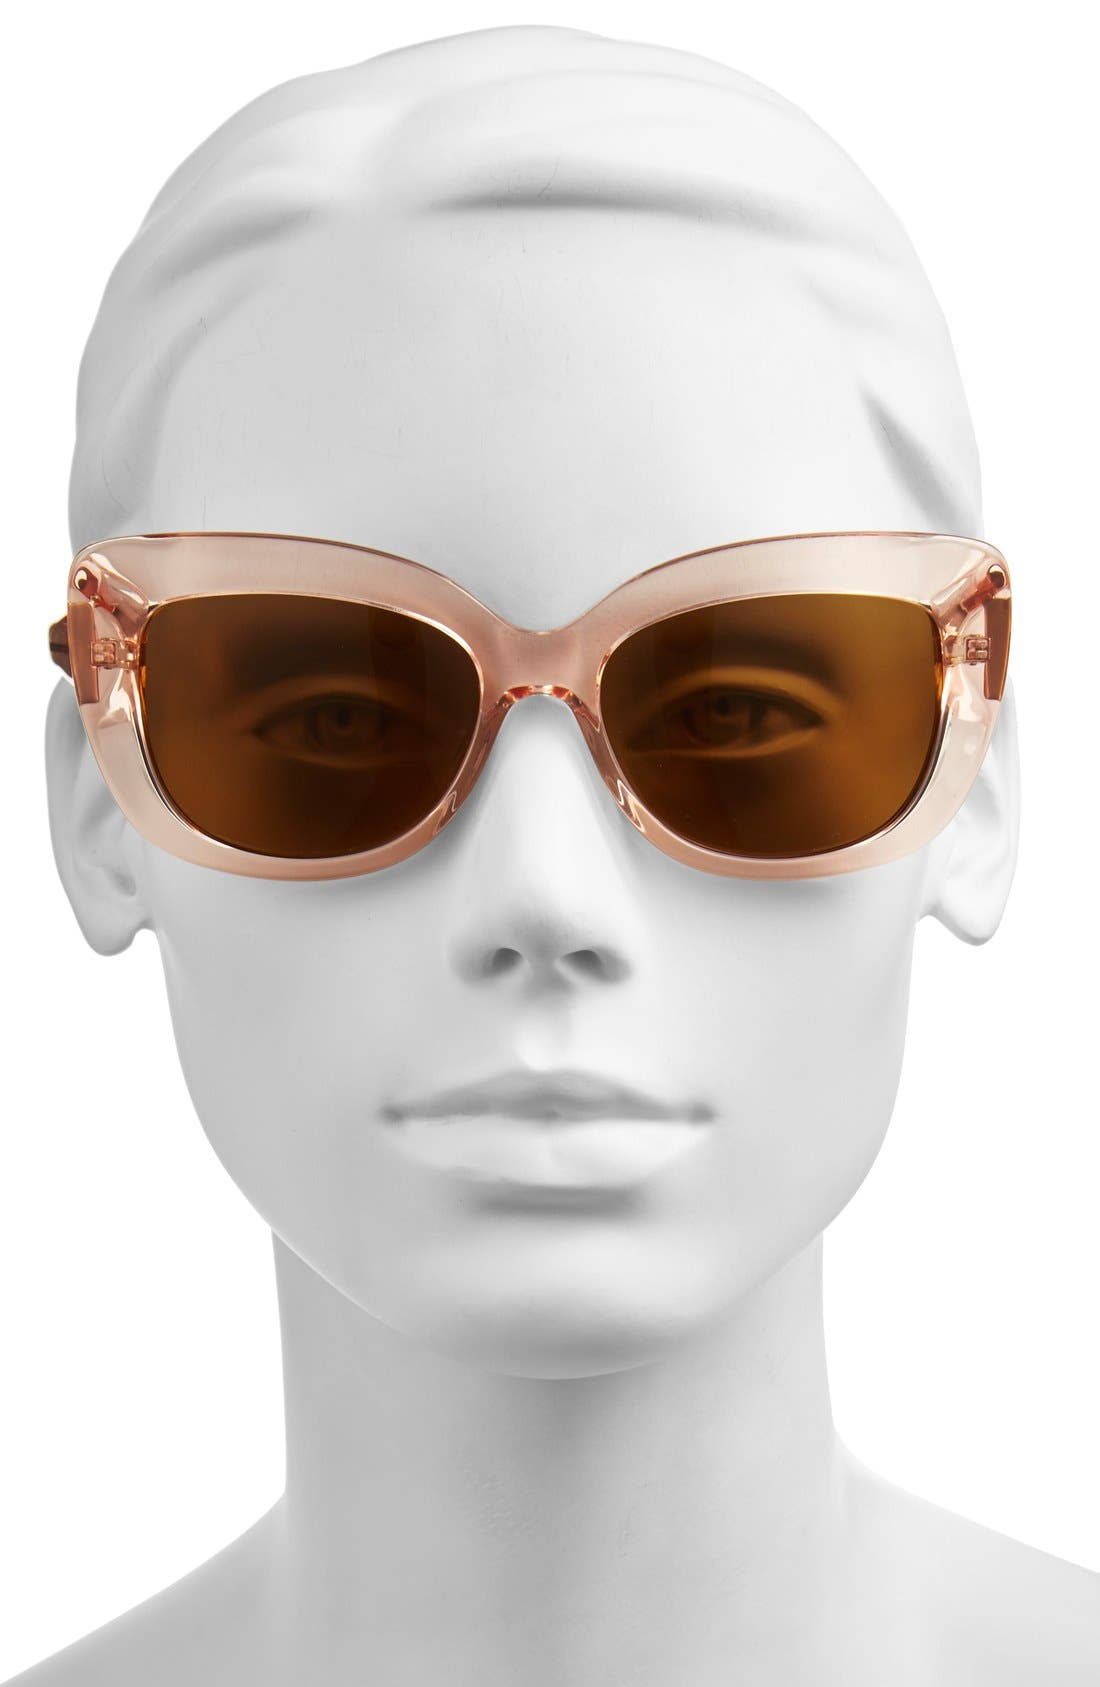 Alternate Image 2  - kate spade new york 'ursula' 55mm polarized cat eye sunglasses (Nordstrom Exclusive)